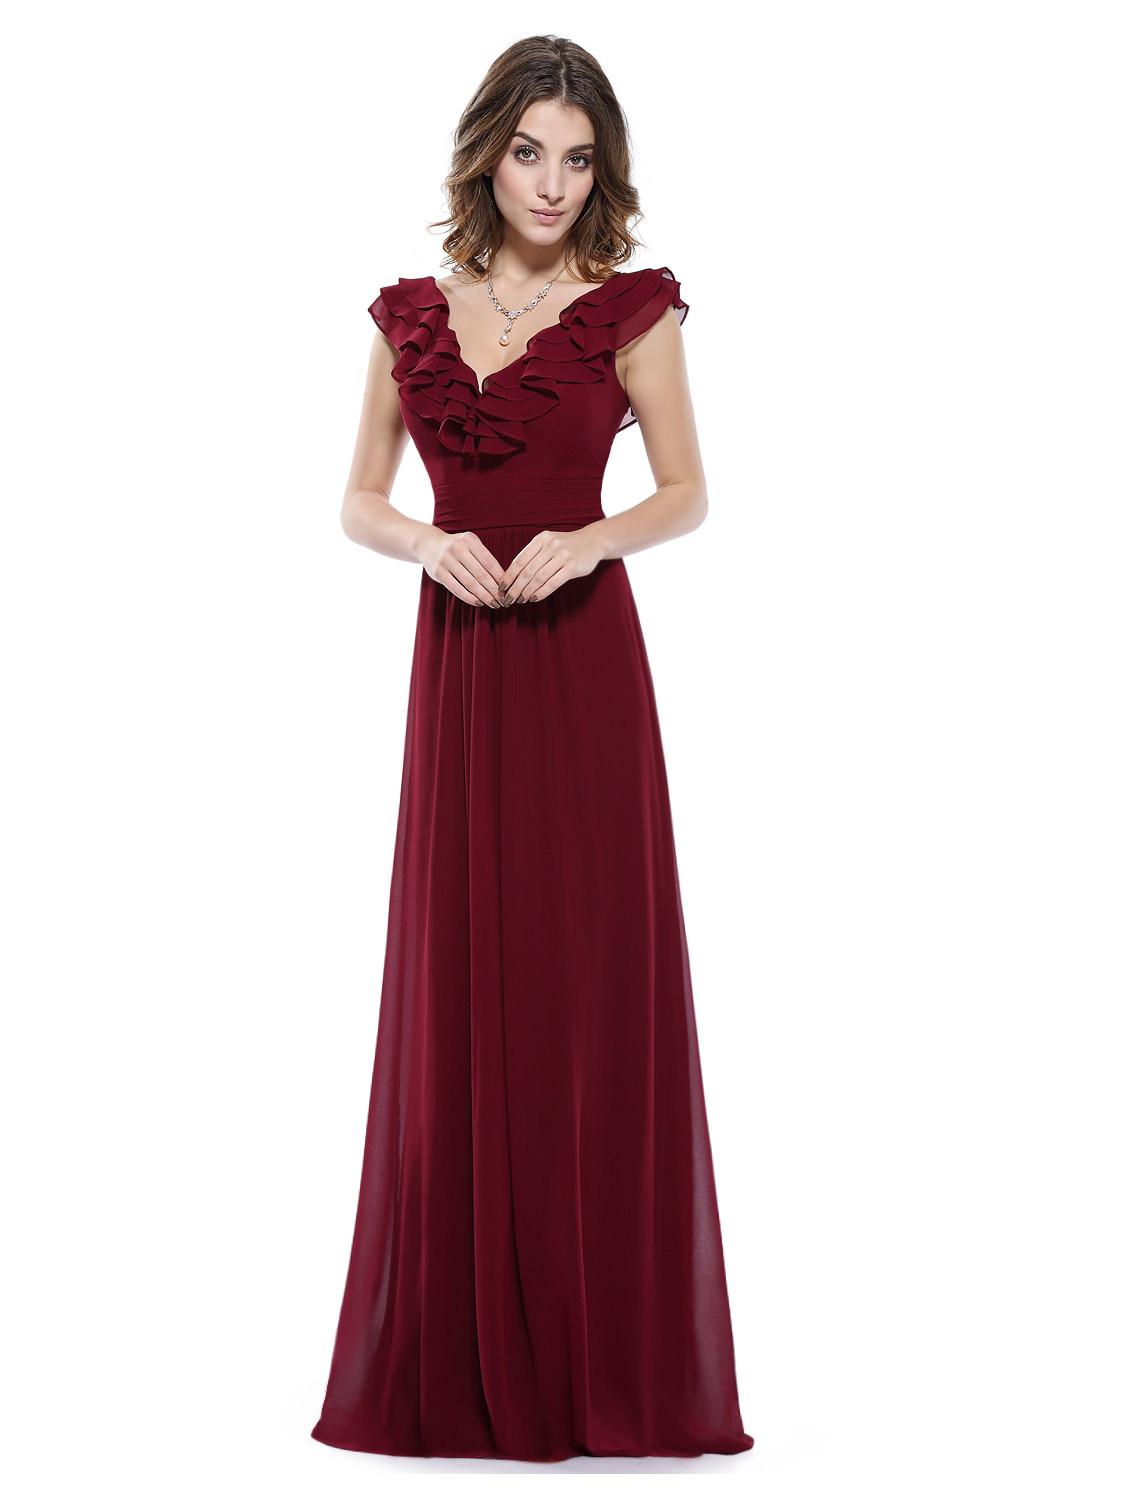 Langes Chiffon Abendkleid in Bordeaux Rot